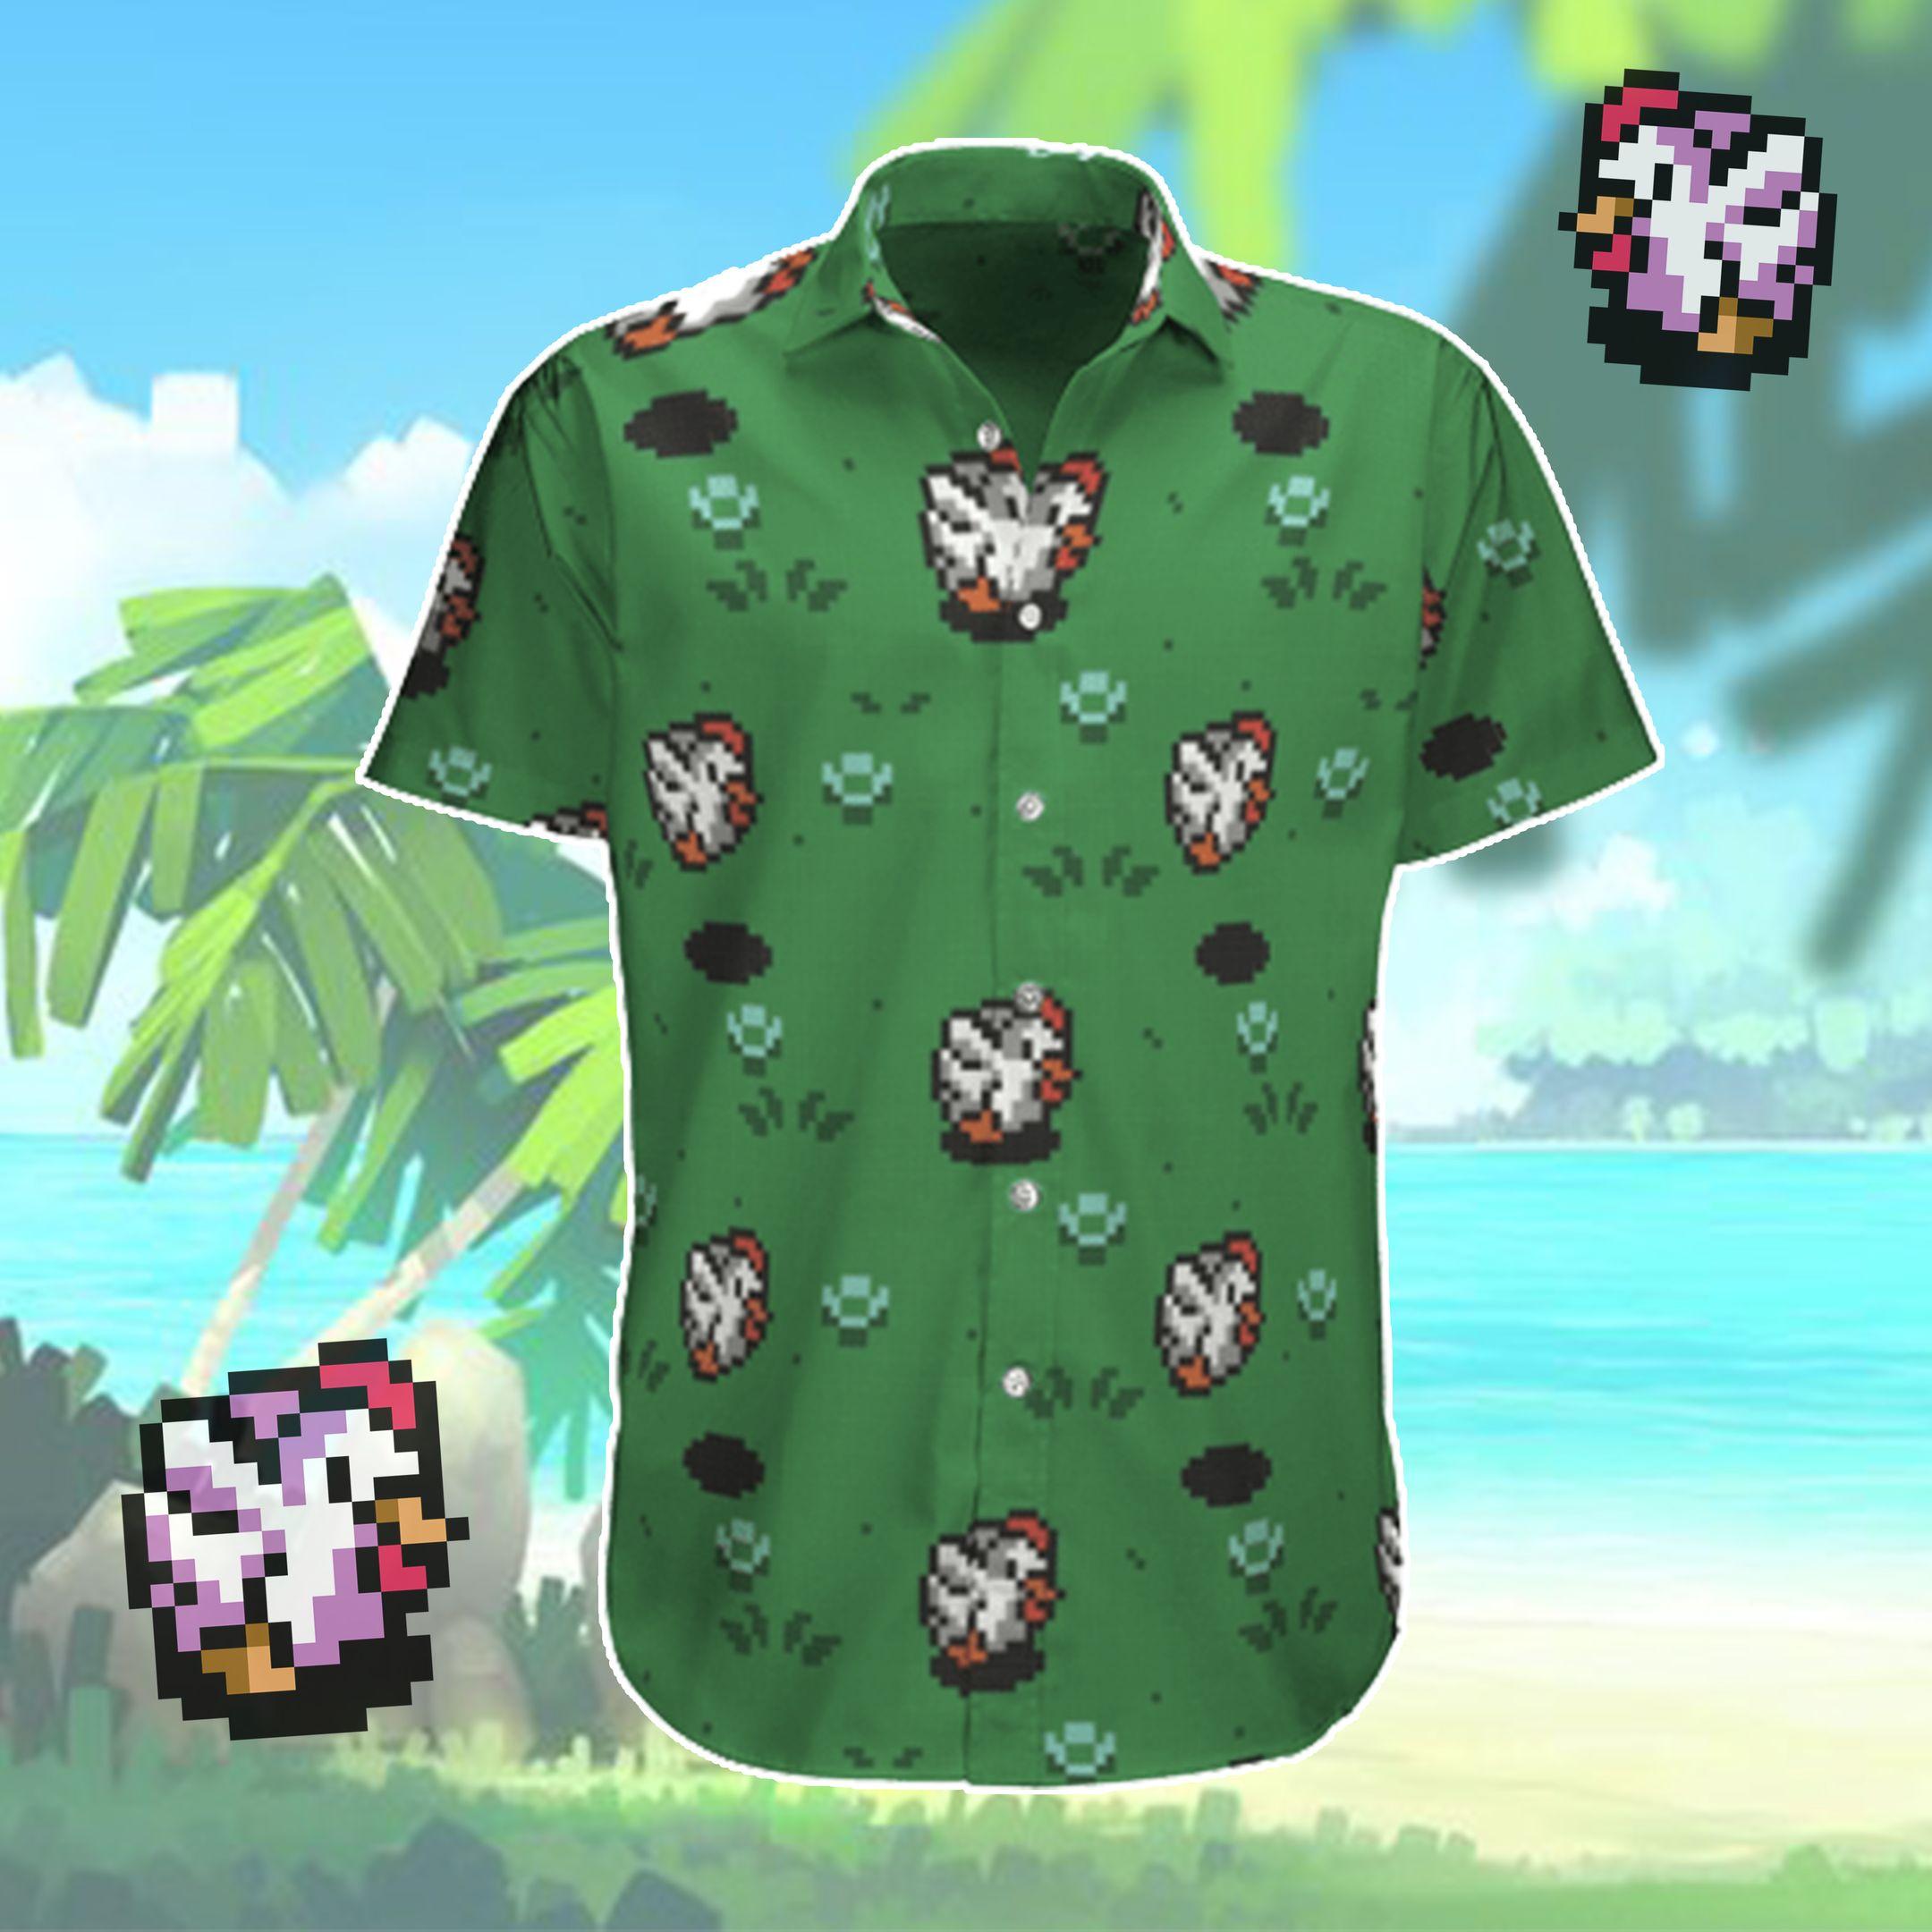 8 bit Cuccos Hawaiian Shirt and Beach Shorts